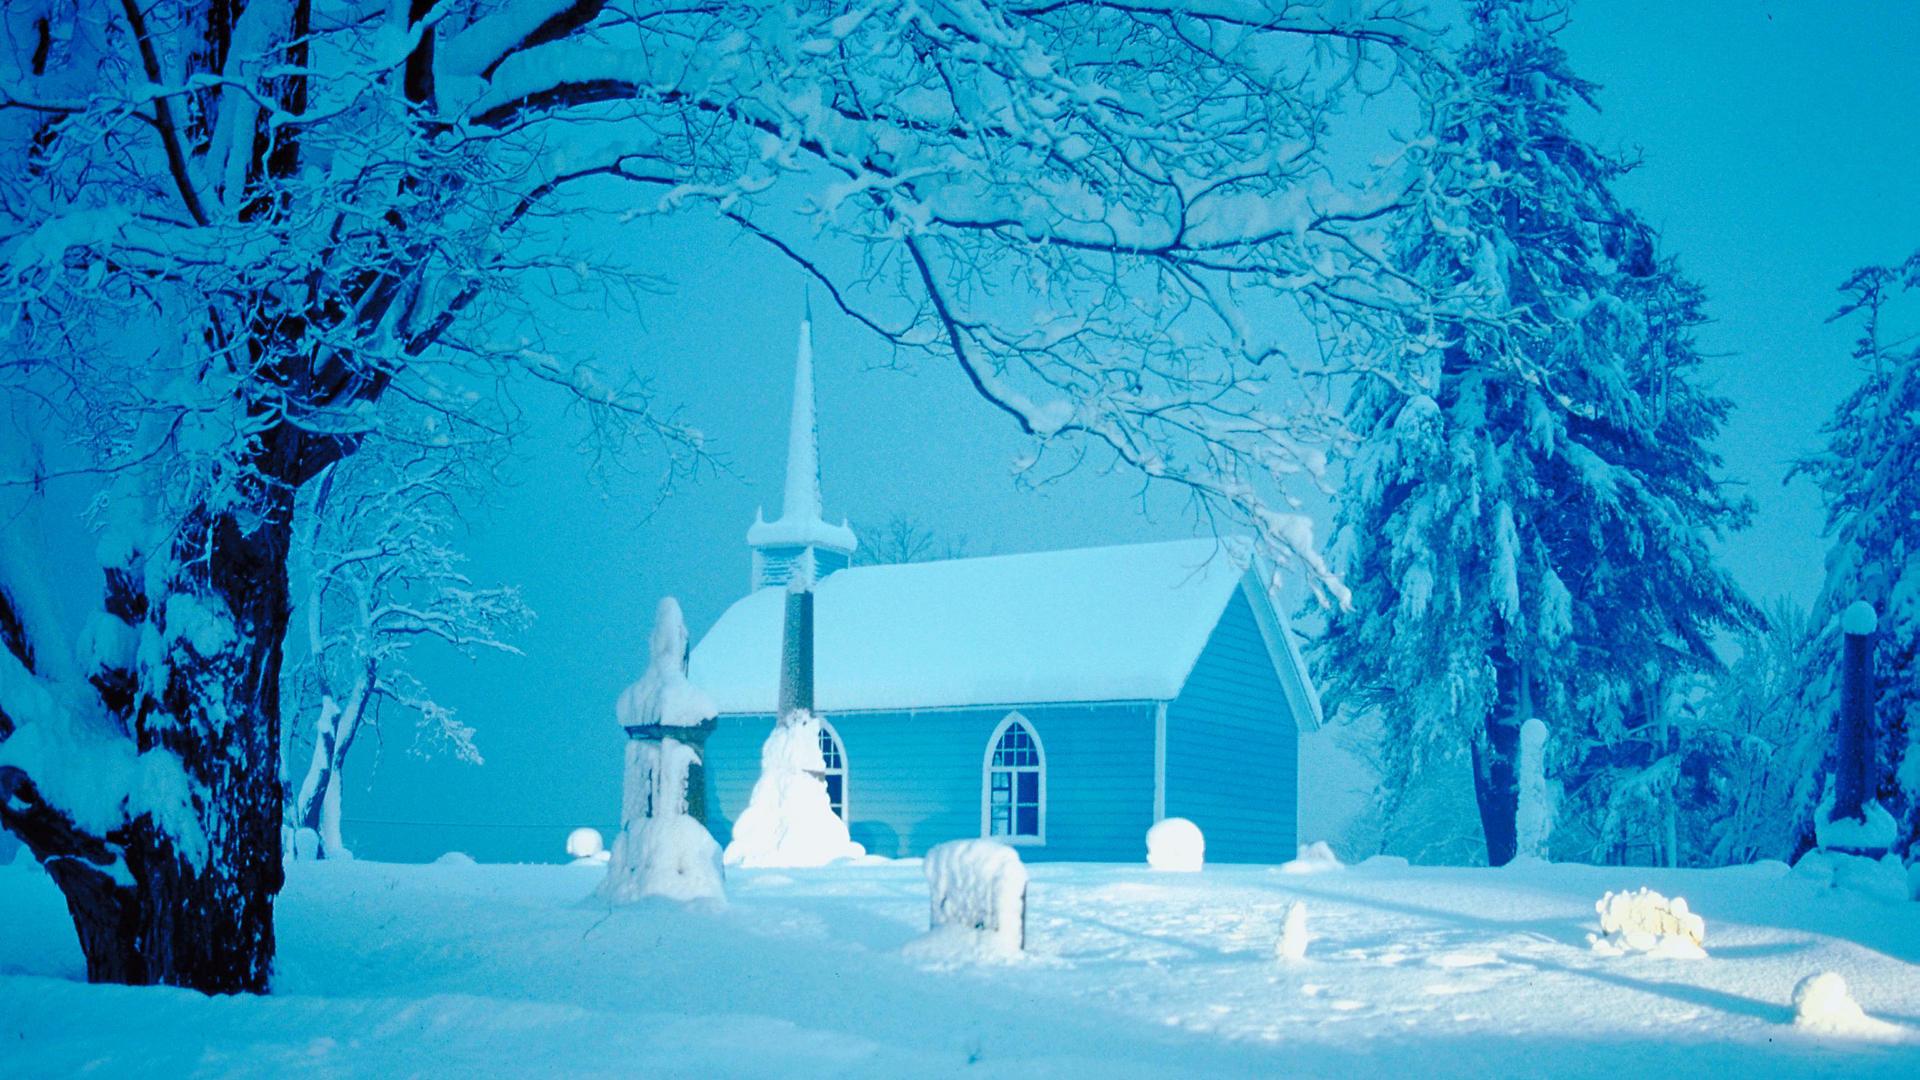 Christmas Winter Scenes Wallpaper 1